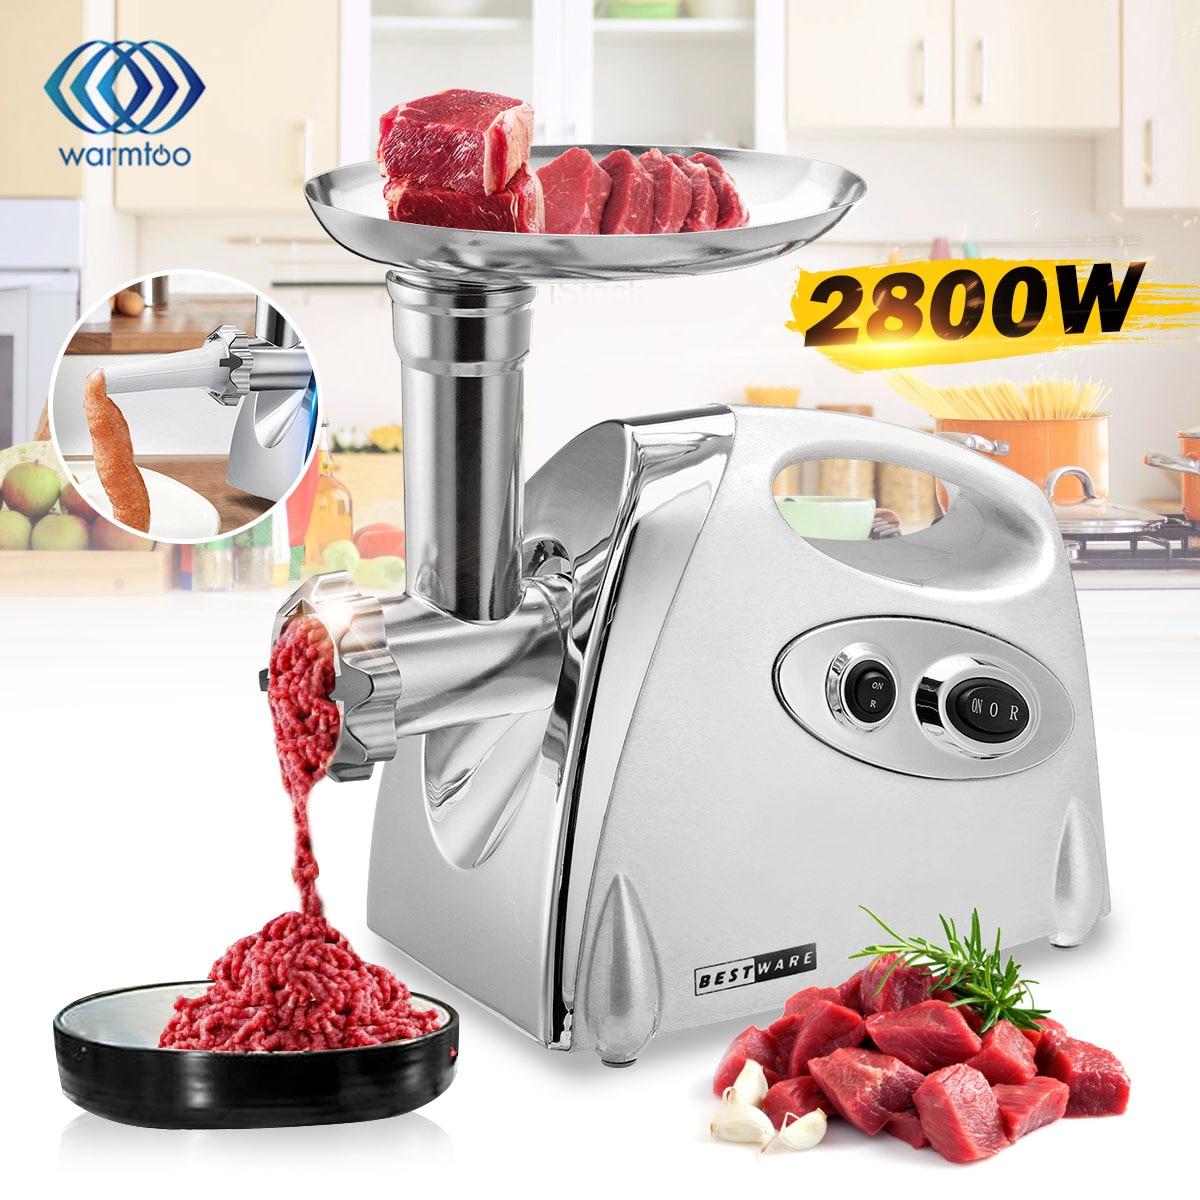 2800W Electric Meat Grinders Food Mincer Chopper Sausage Stuffer Meat Mincer Sonifer Kitchen Multifunction Meat Processor